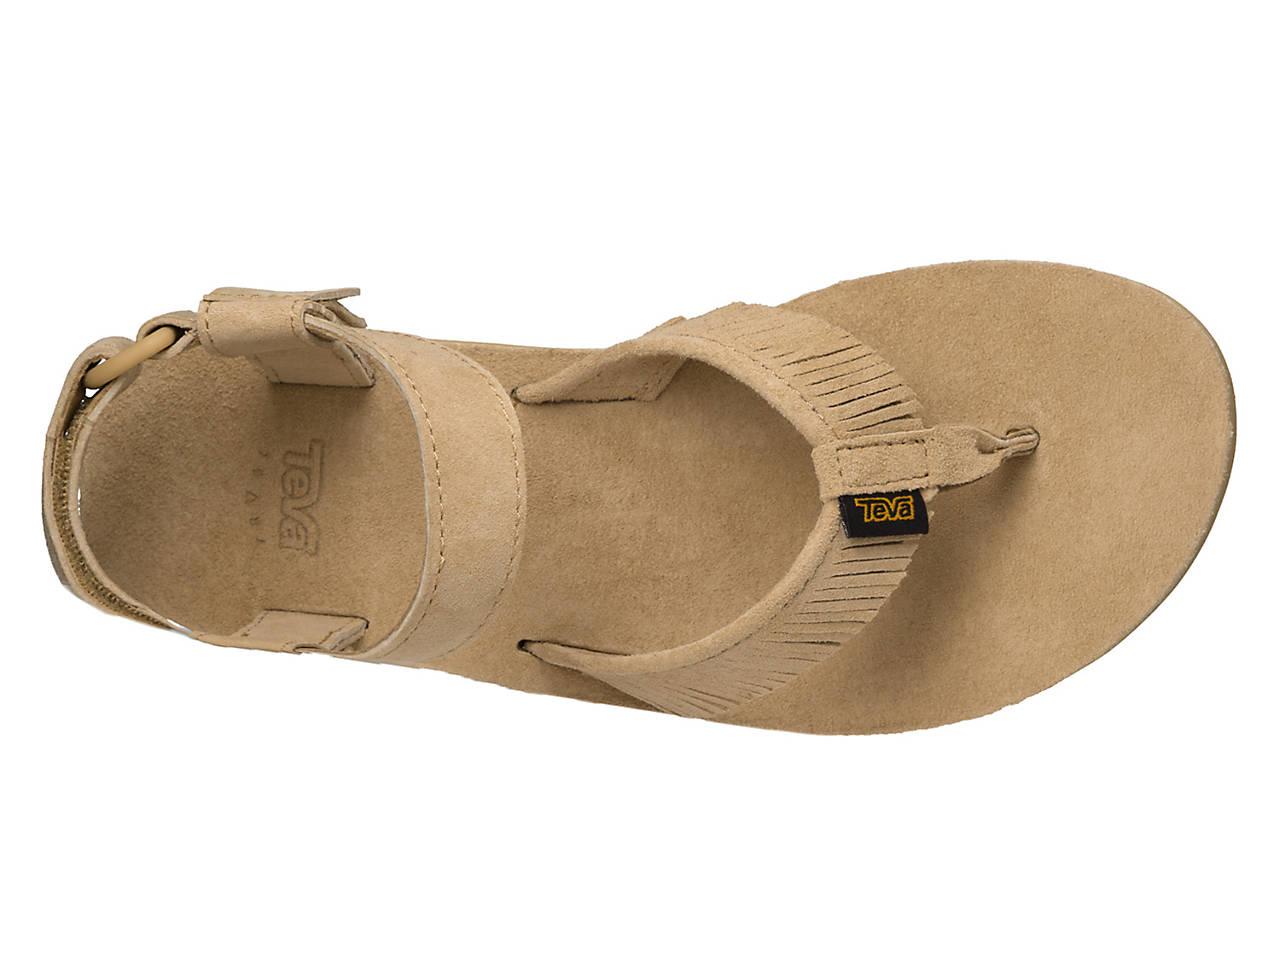 01cbe20a44d1 Teva Original Leather Fringe Flat Sandal Women s Shoes